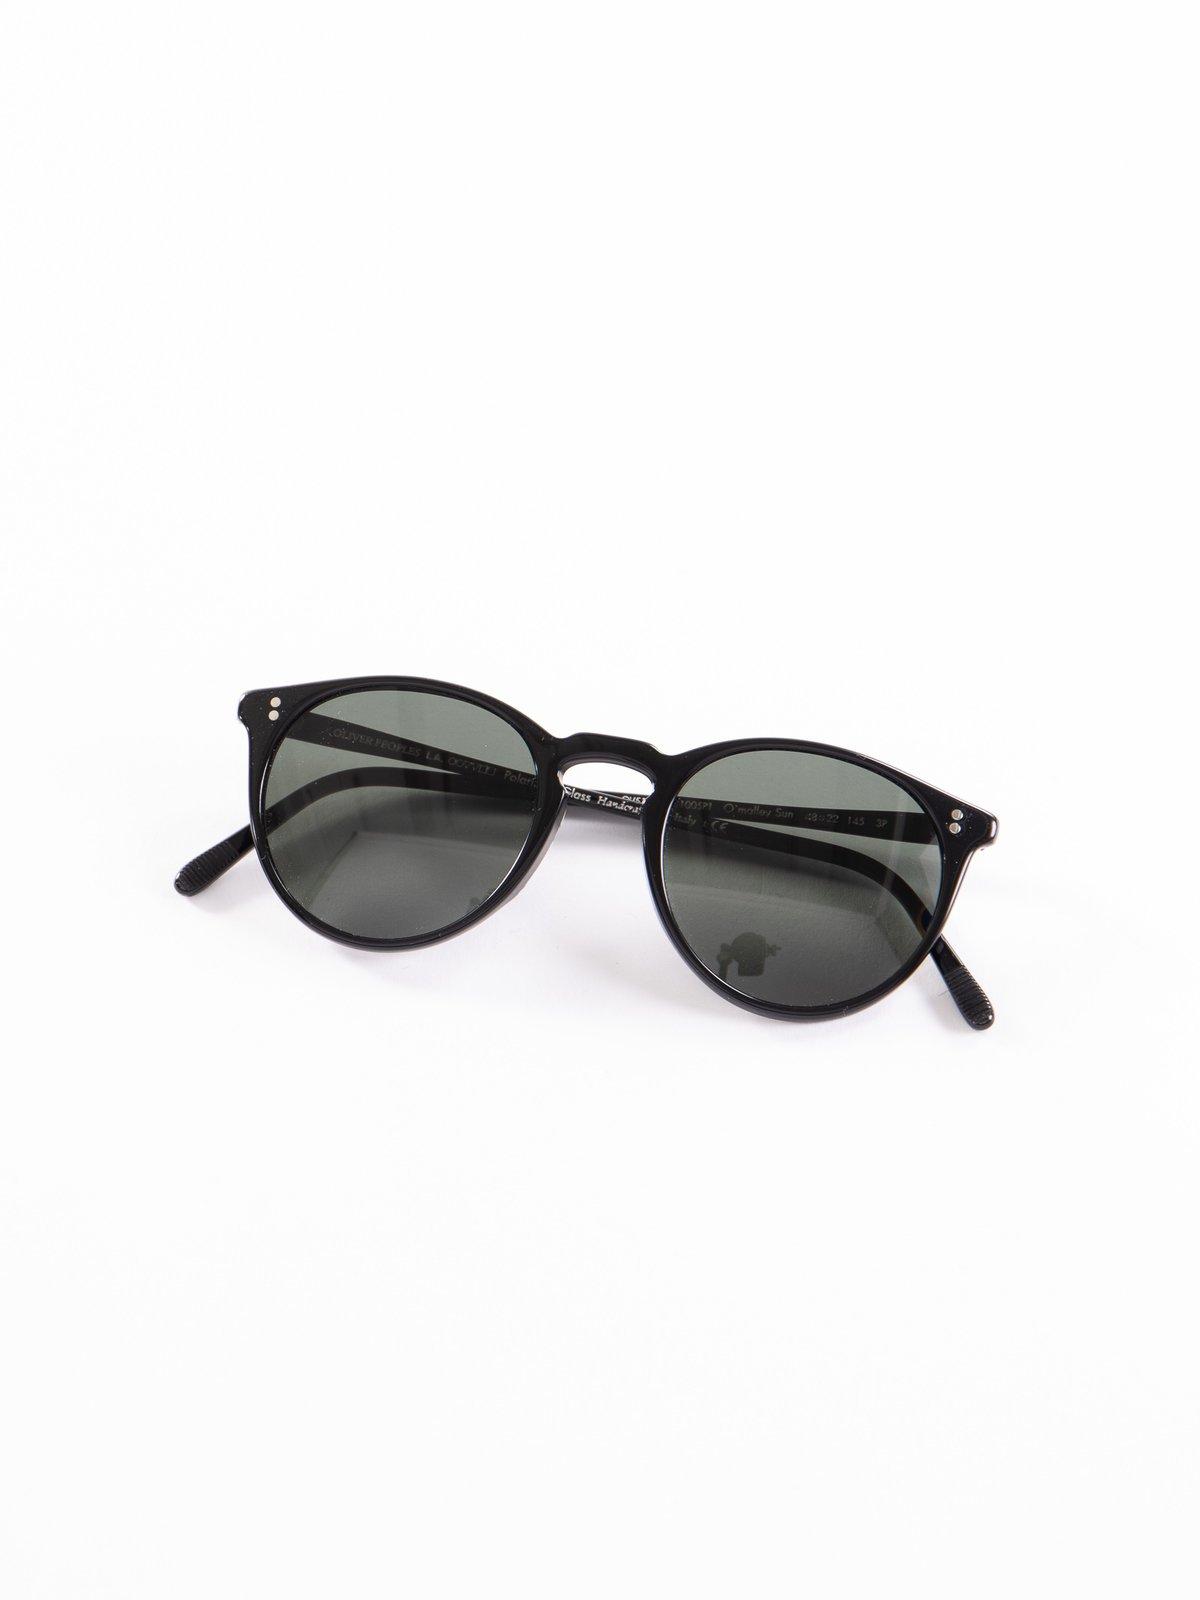 Black/Grey Polar O'Malley Sunglasses - Image 1